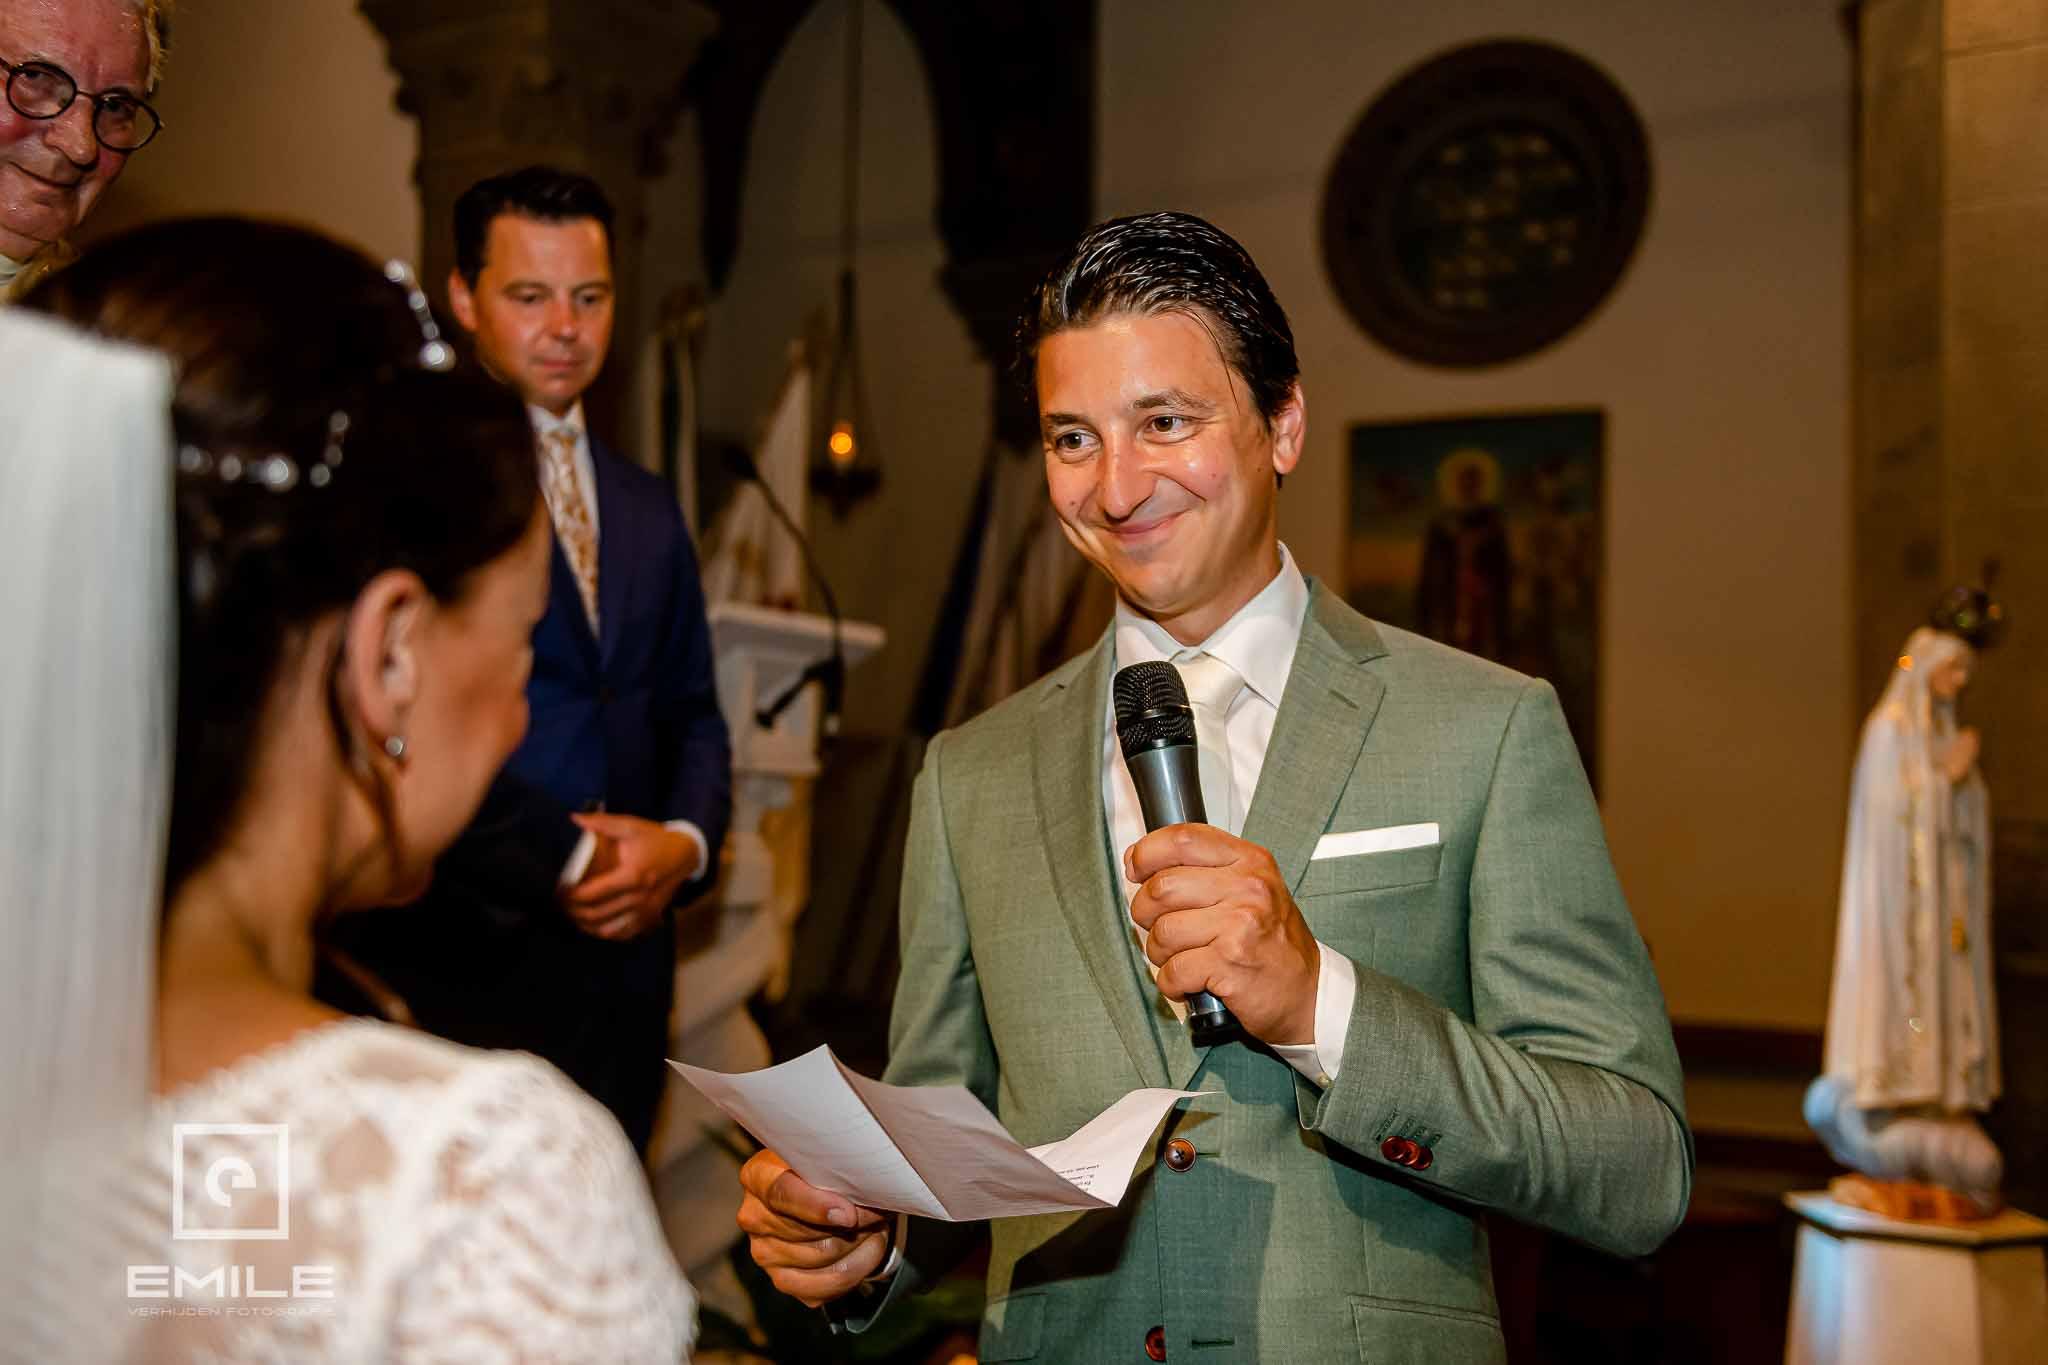 Stralende bruidegom die de geloftes aflegd - Destination wedding San Gimignano - Toscane Italie - Iris en Job